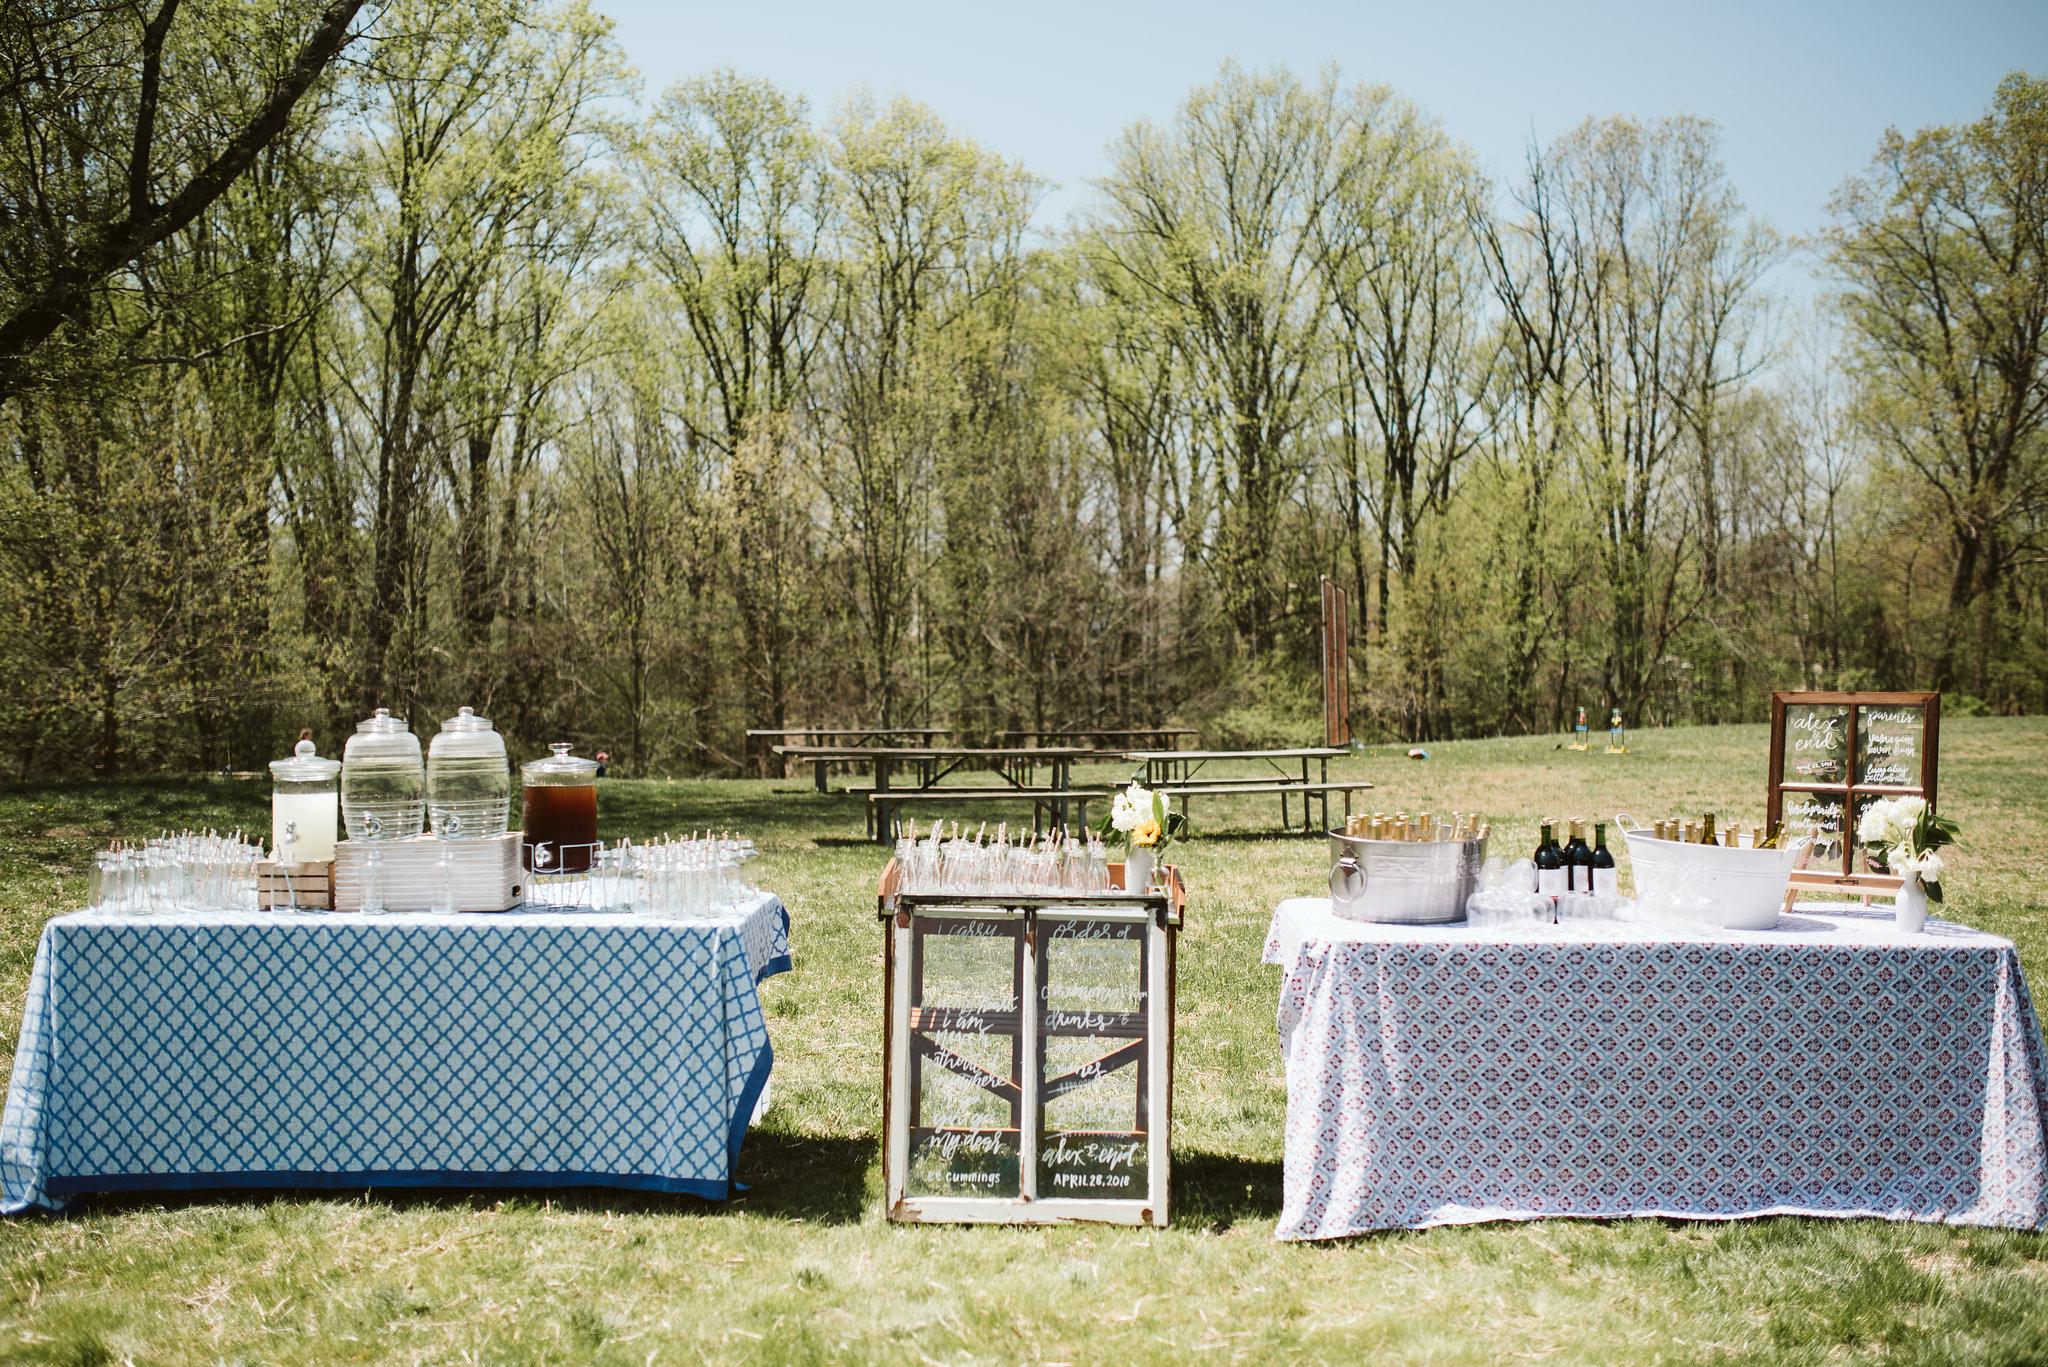 Spring Outdoor Wedding, Park, Baltimore Wedding Photographer, DIY, Classic, Upcycled, Garden Party, Romantic, Homemade Drinks Bar